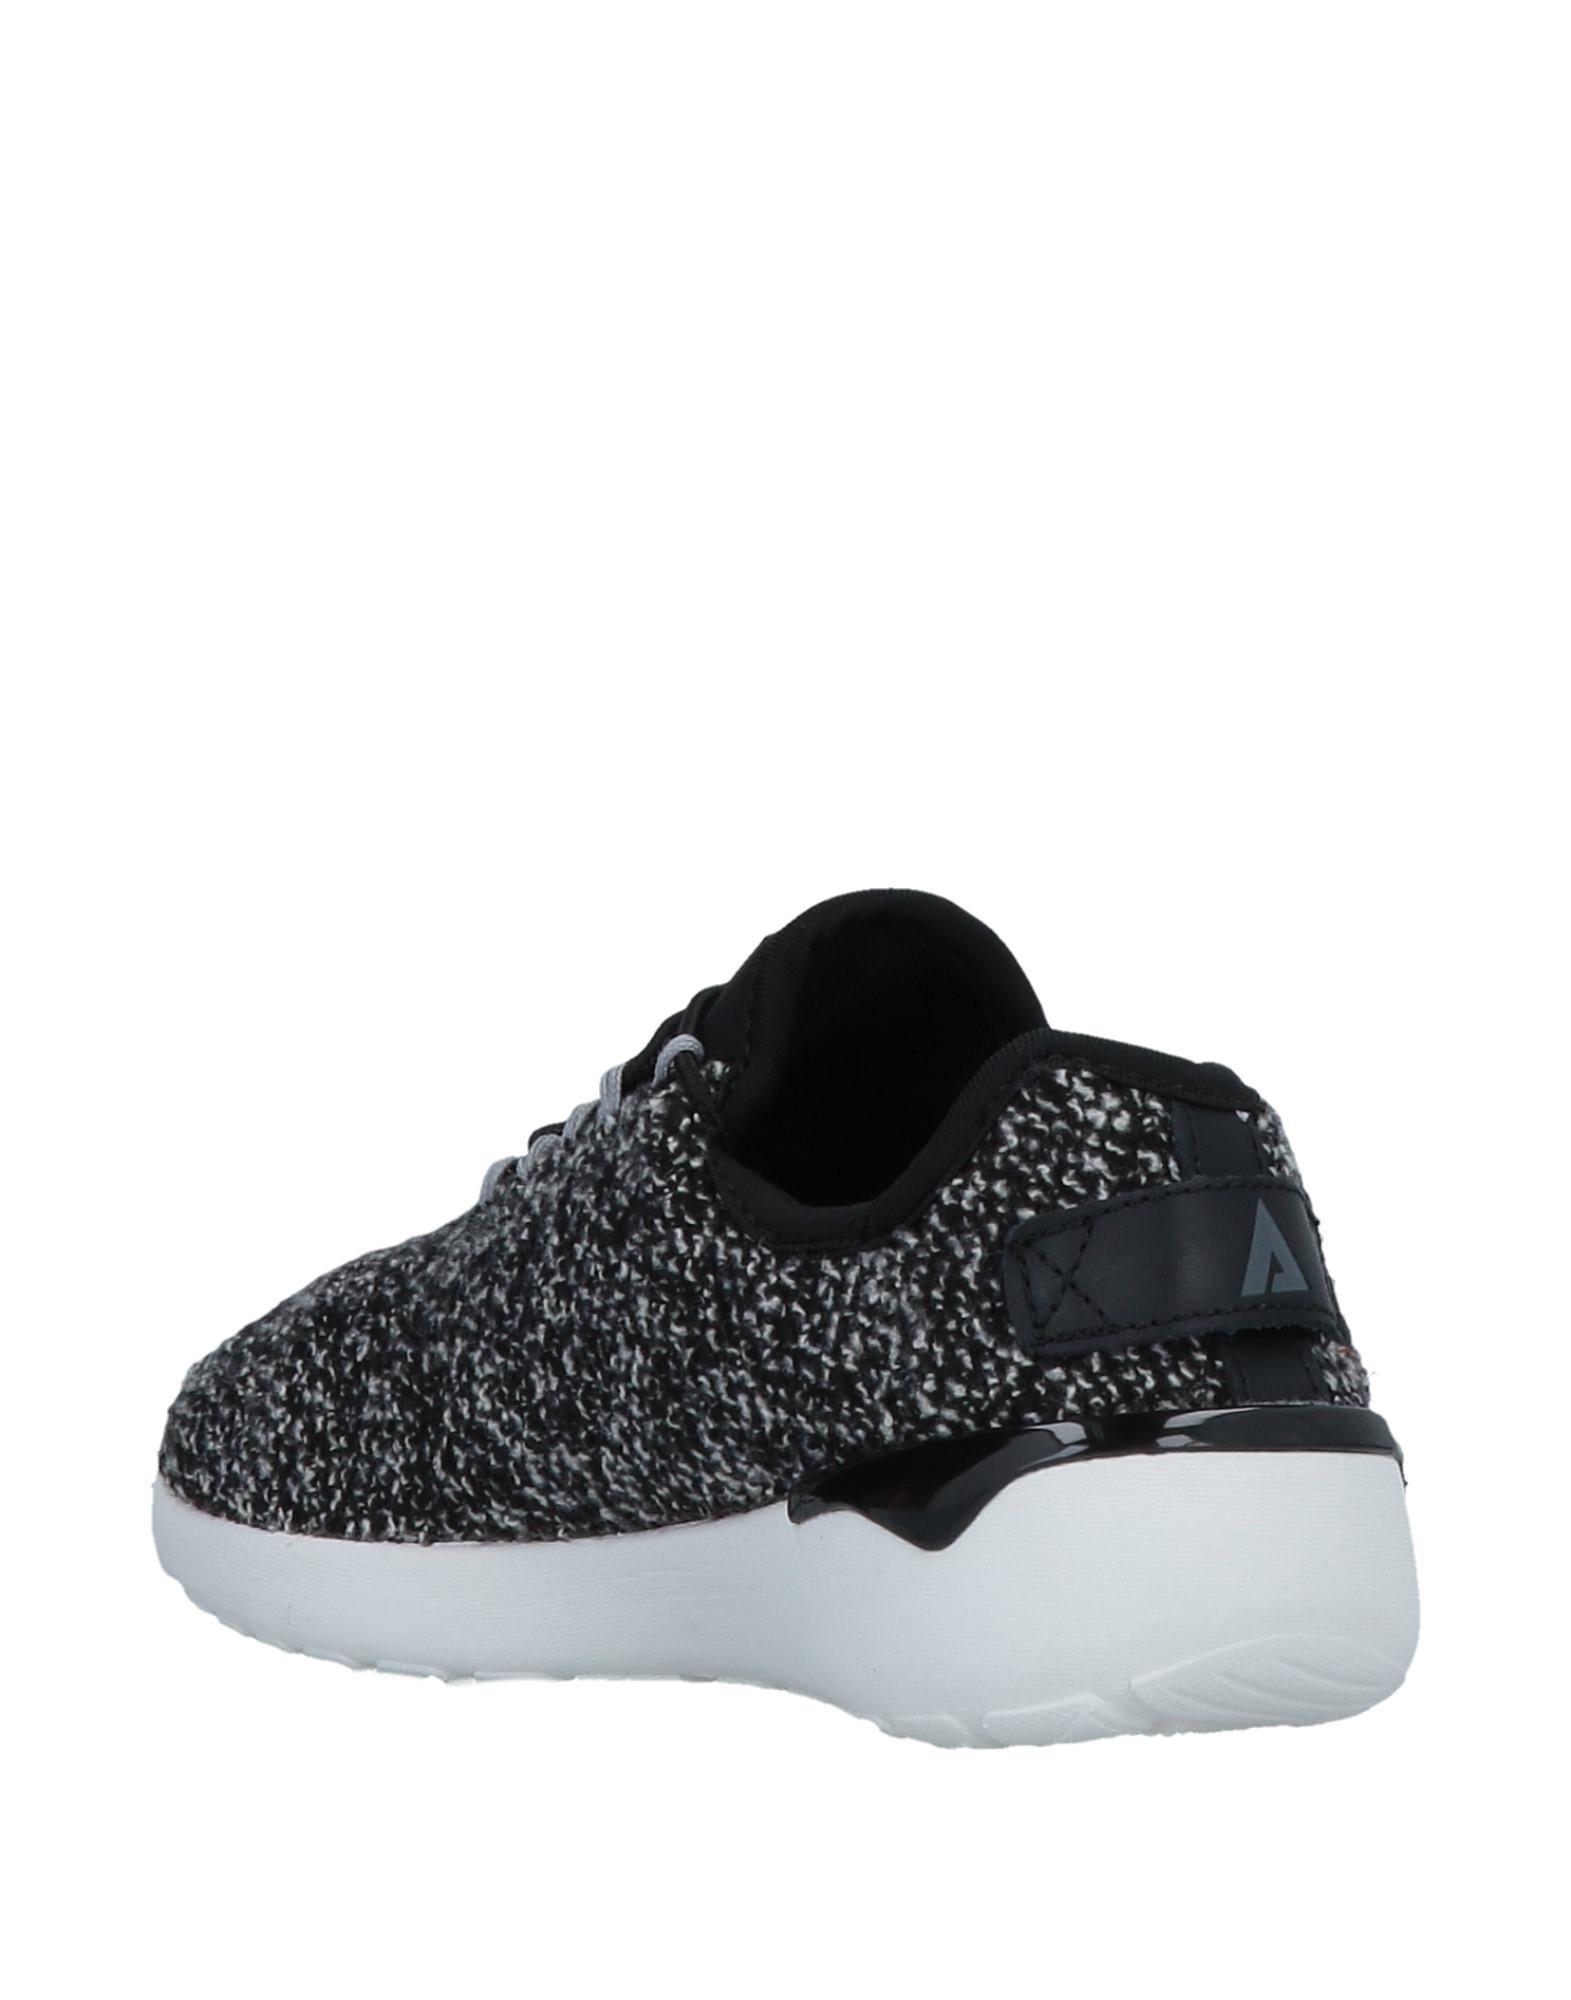 Asfvlt  Sneakers Damen  11506877RJ  Asfvlt 3bdca1